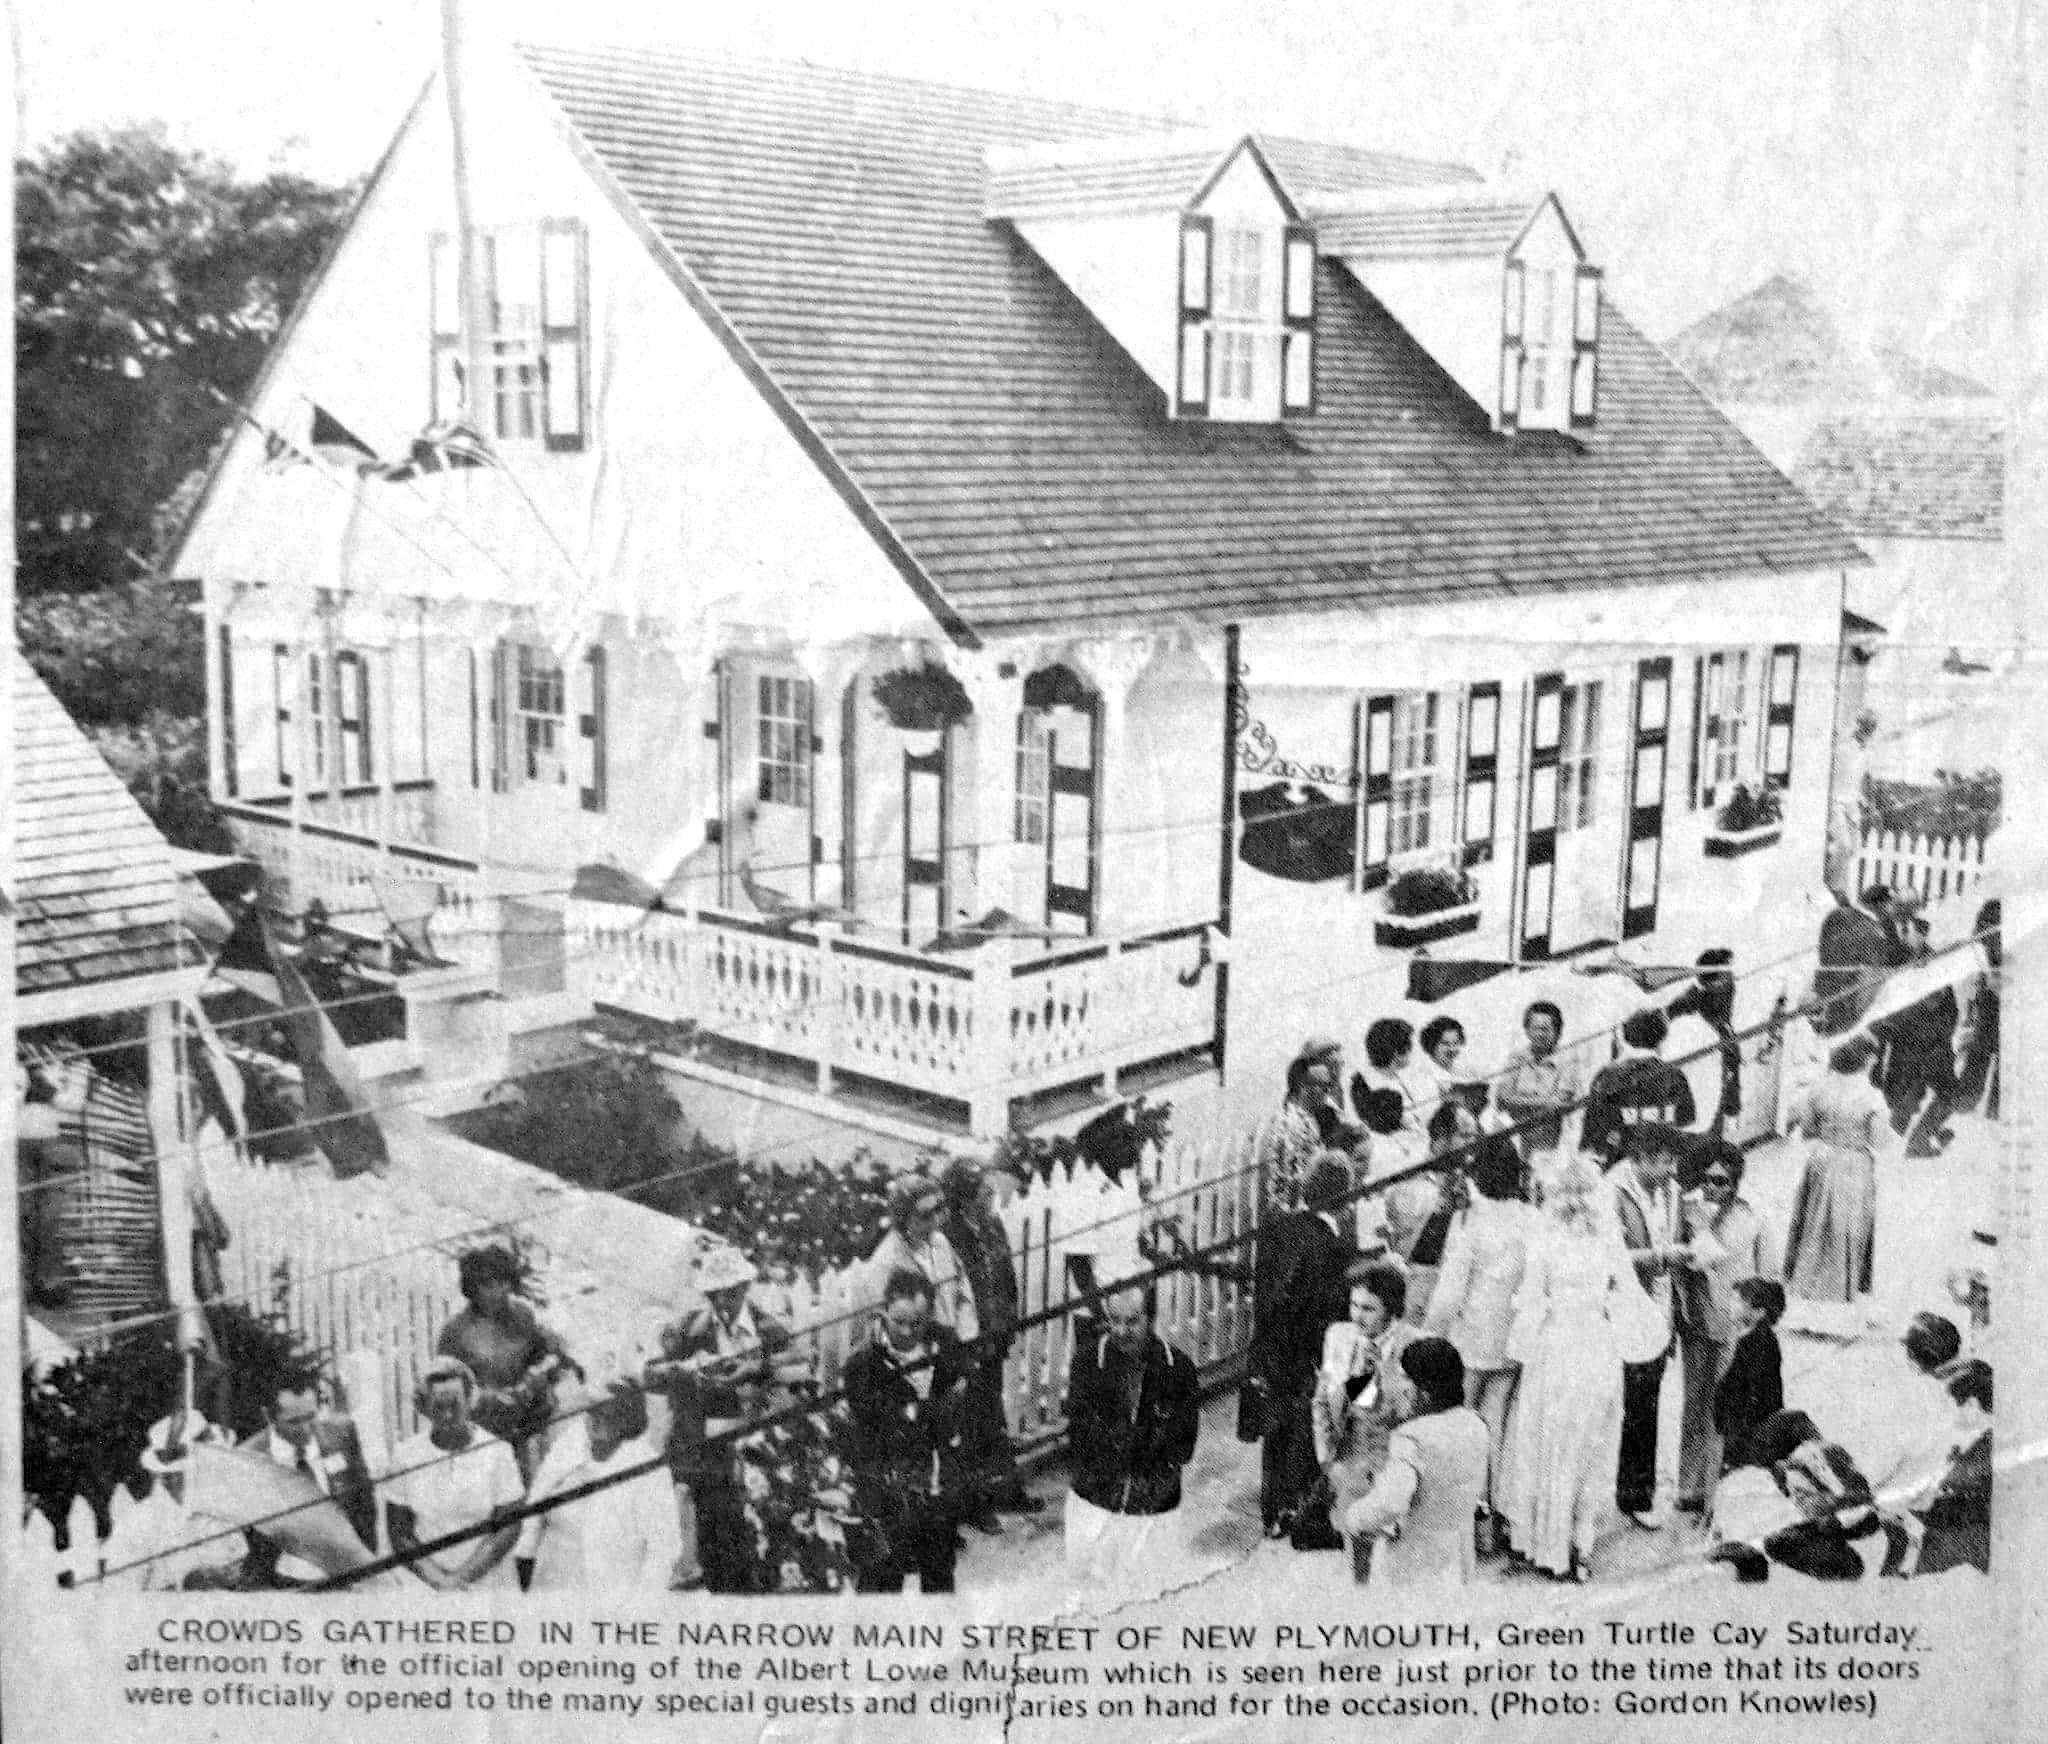 Albert Lowe Museum GTC Opening Nov 1976